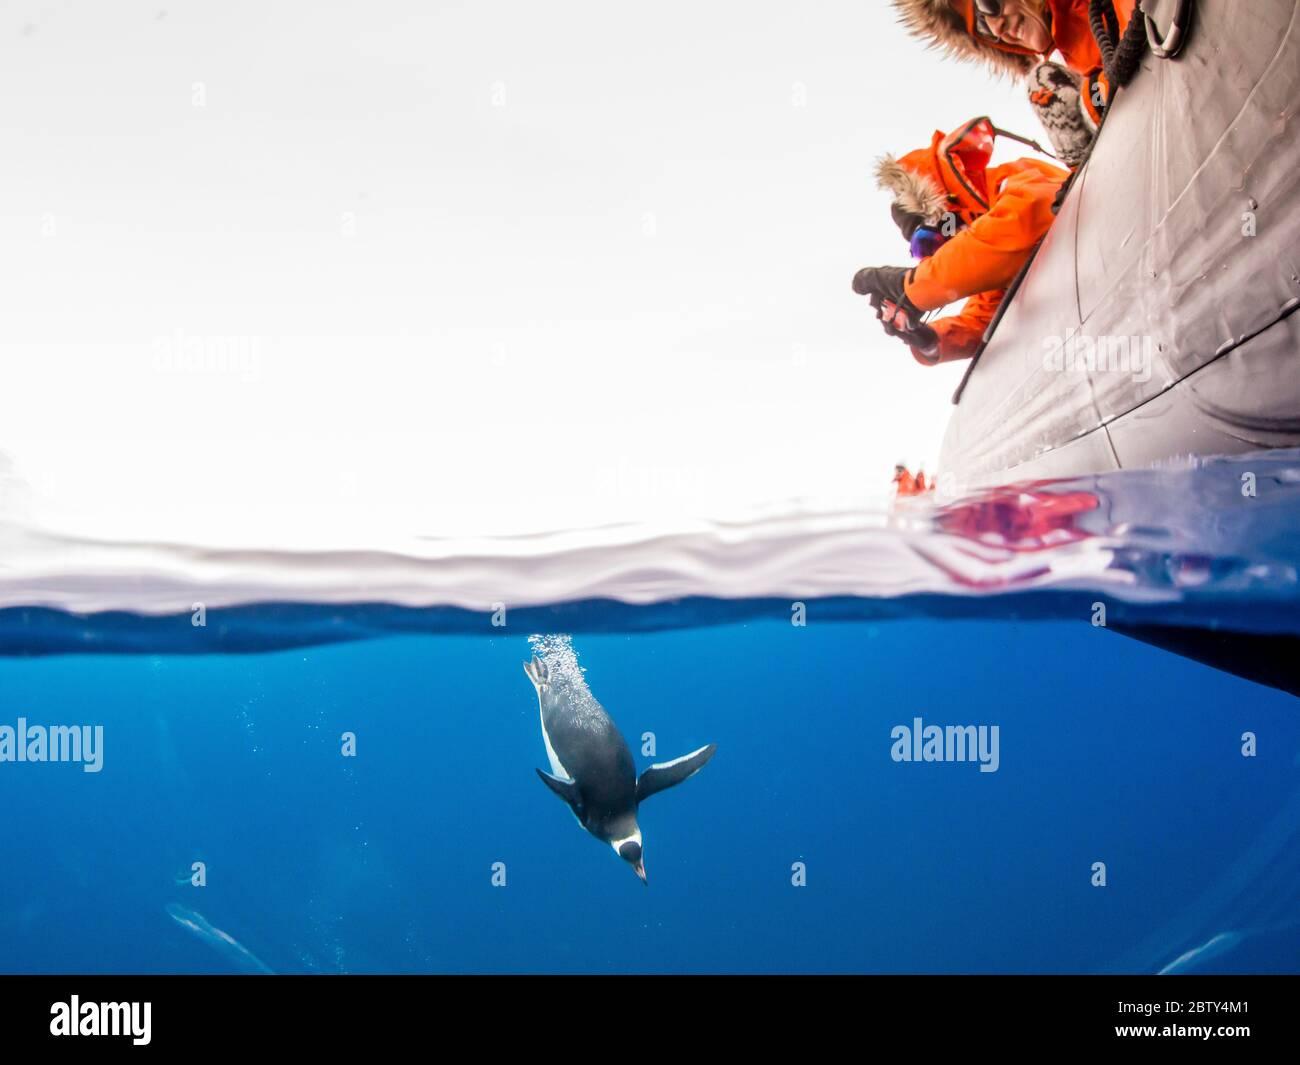 Gentoo-Pinguine (Pygoscelis papua), Unterwasser in klarem Wasser in Lindblad Cove, Trinity Peninsula, Antarktis, Polarregionen Stockfoto